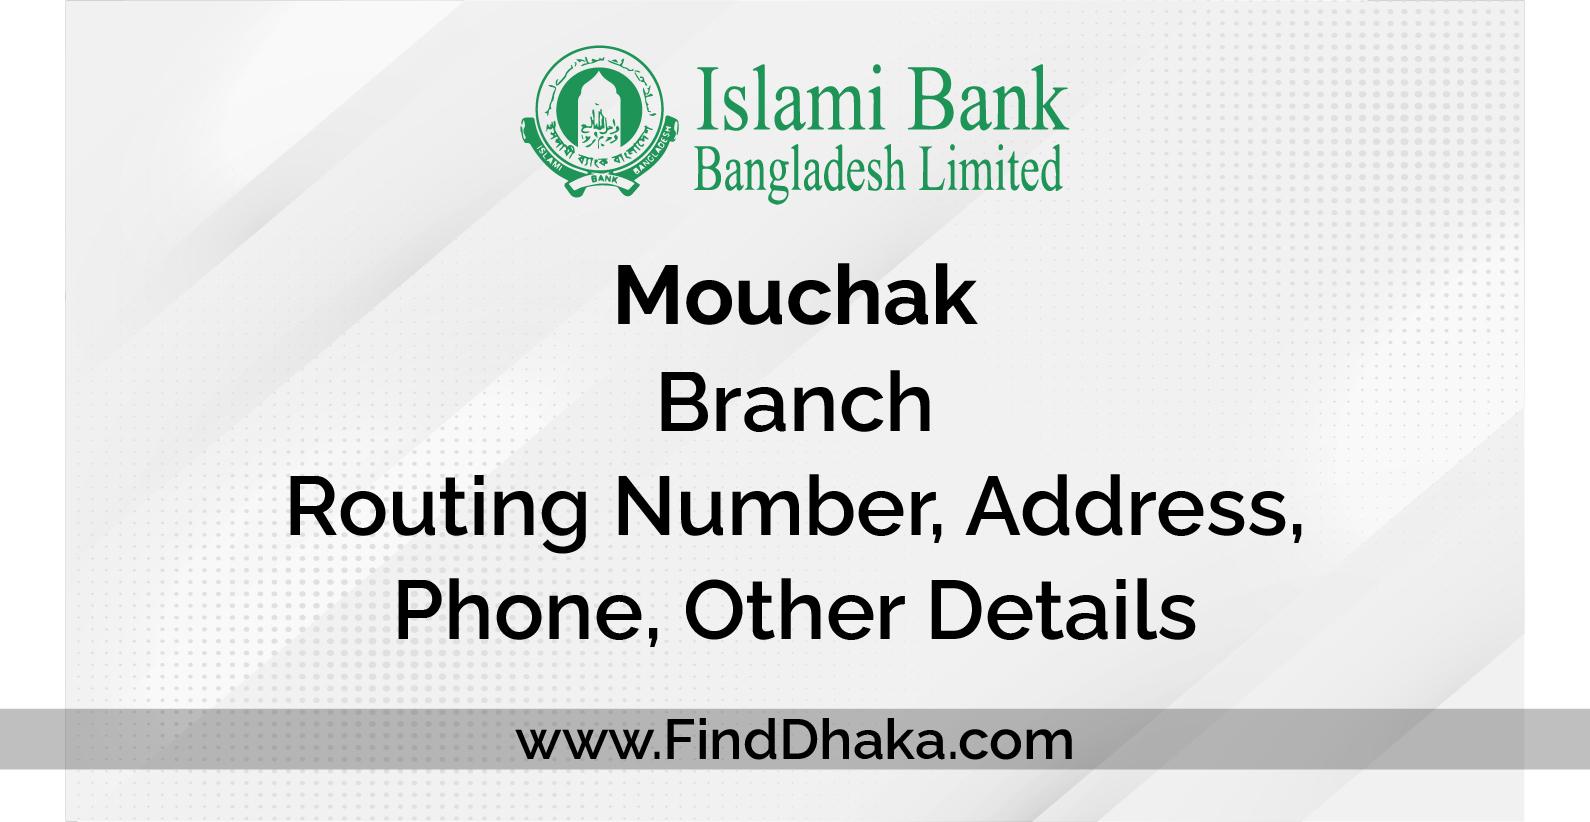 Islami Bank info010000 1